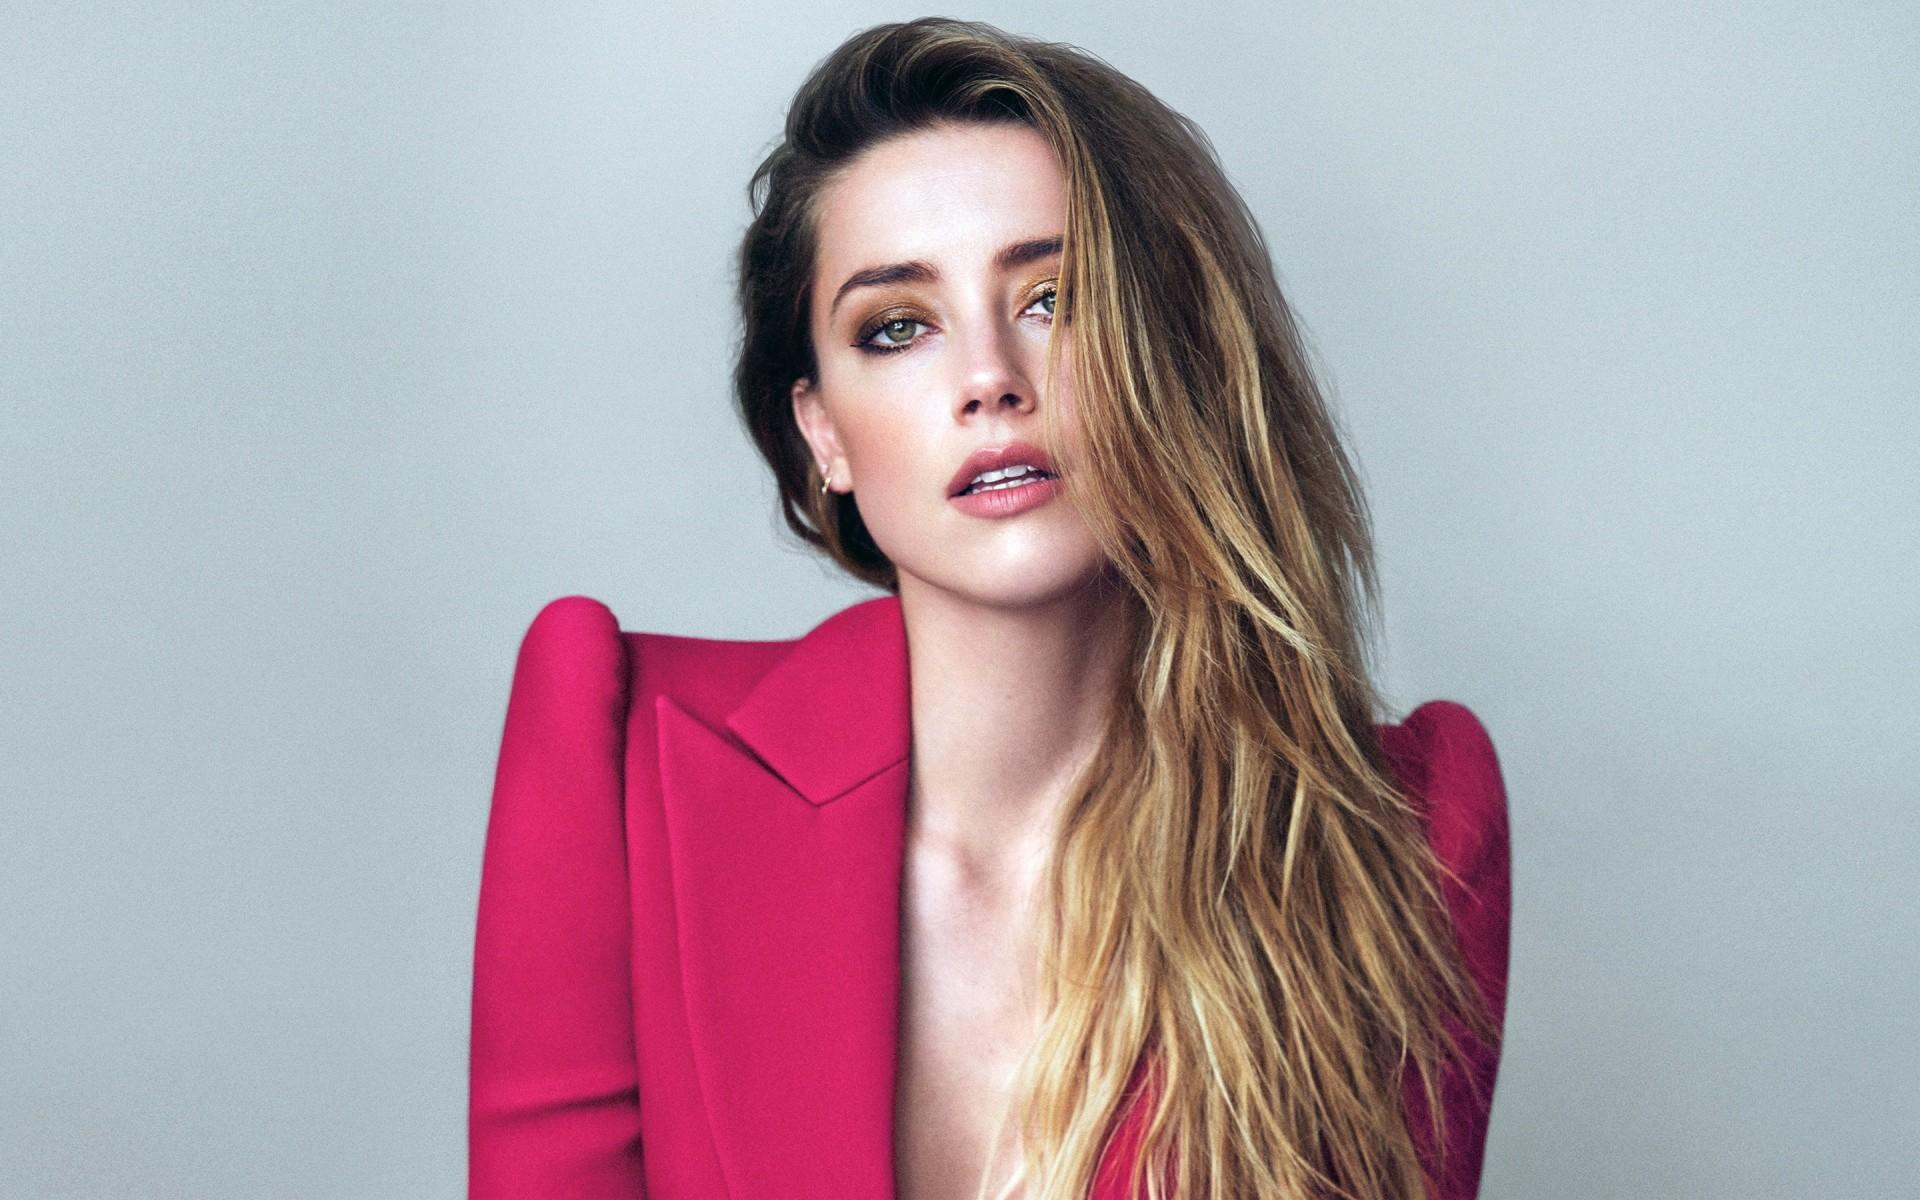 Free Amber Heard phone wallpaper by chelcie67